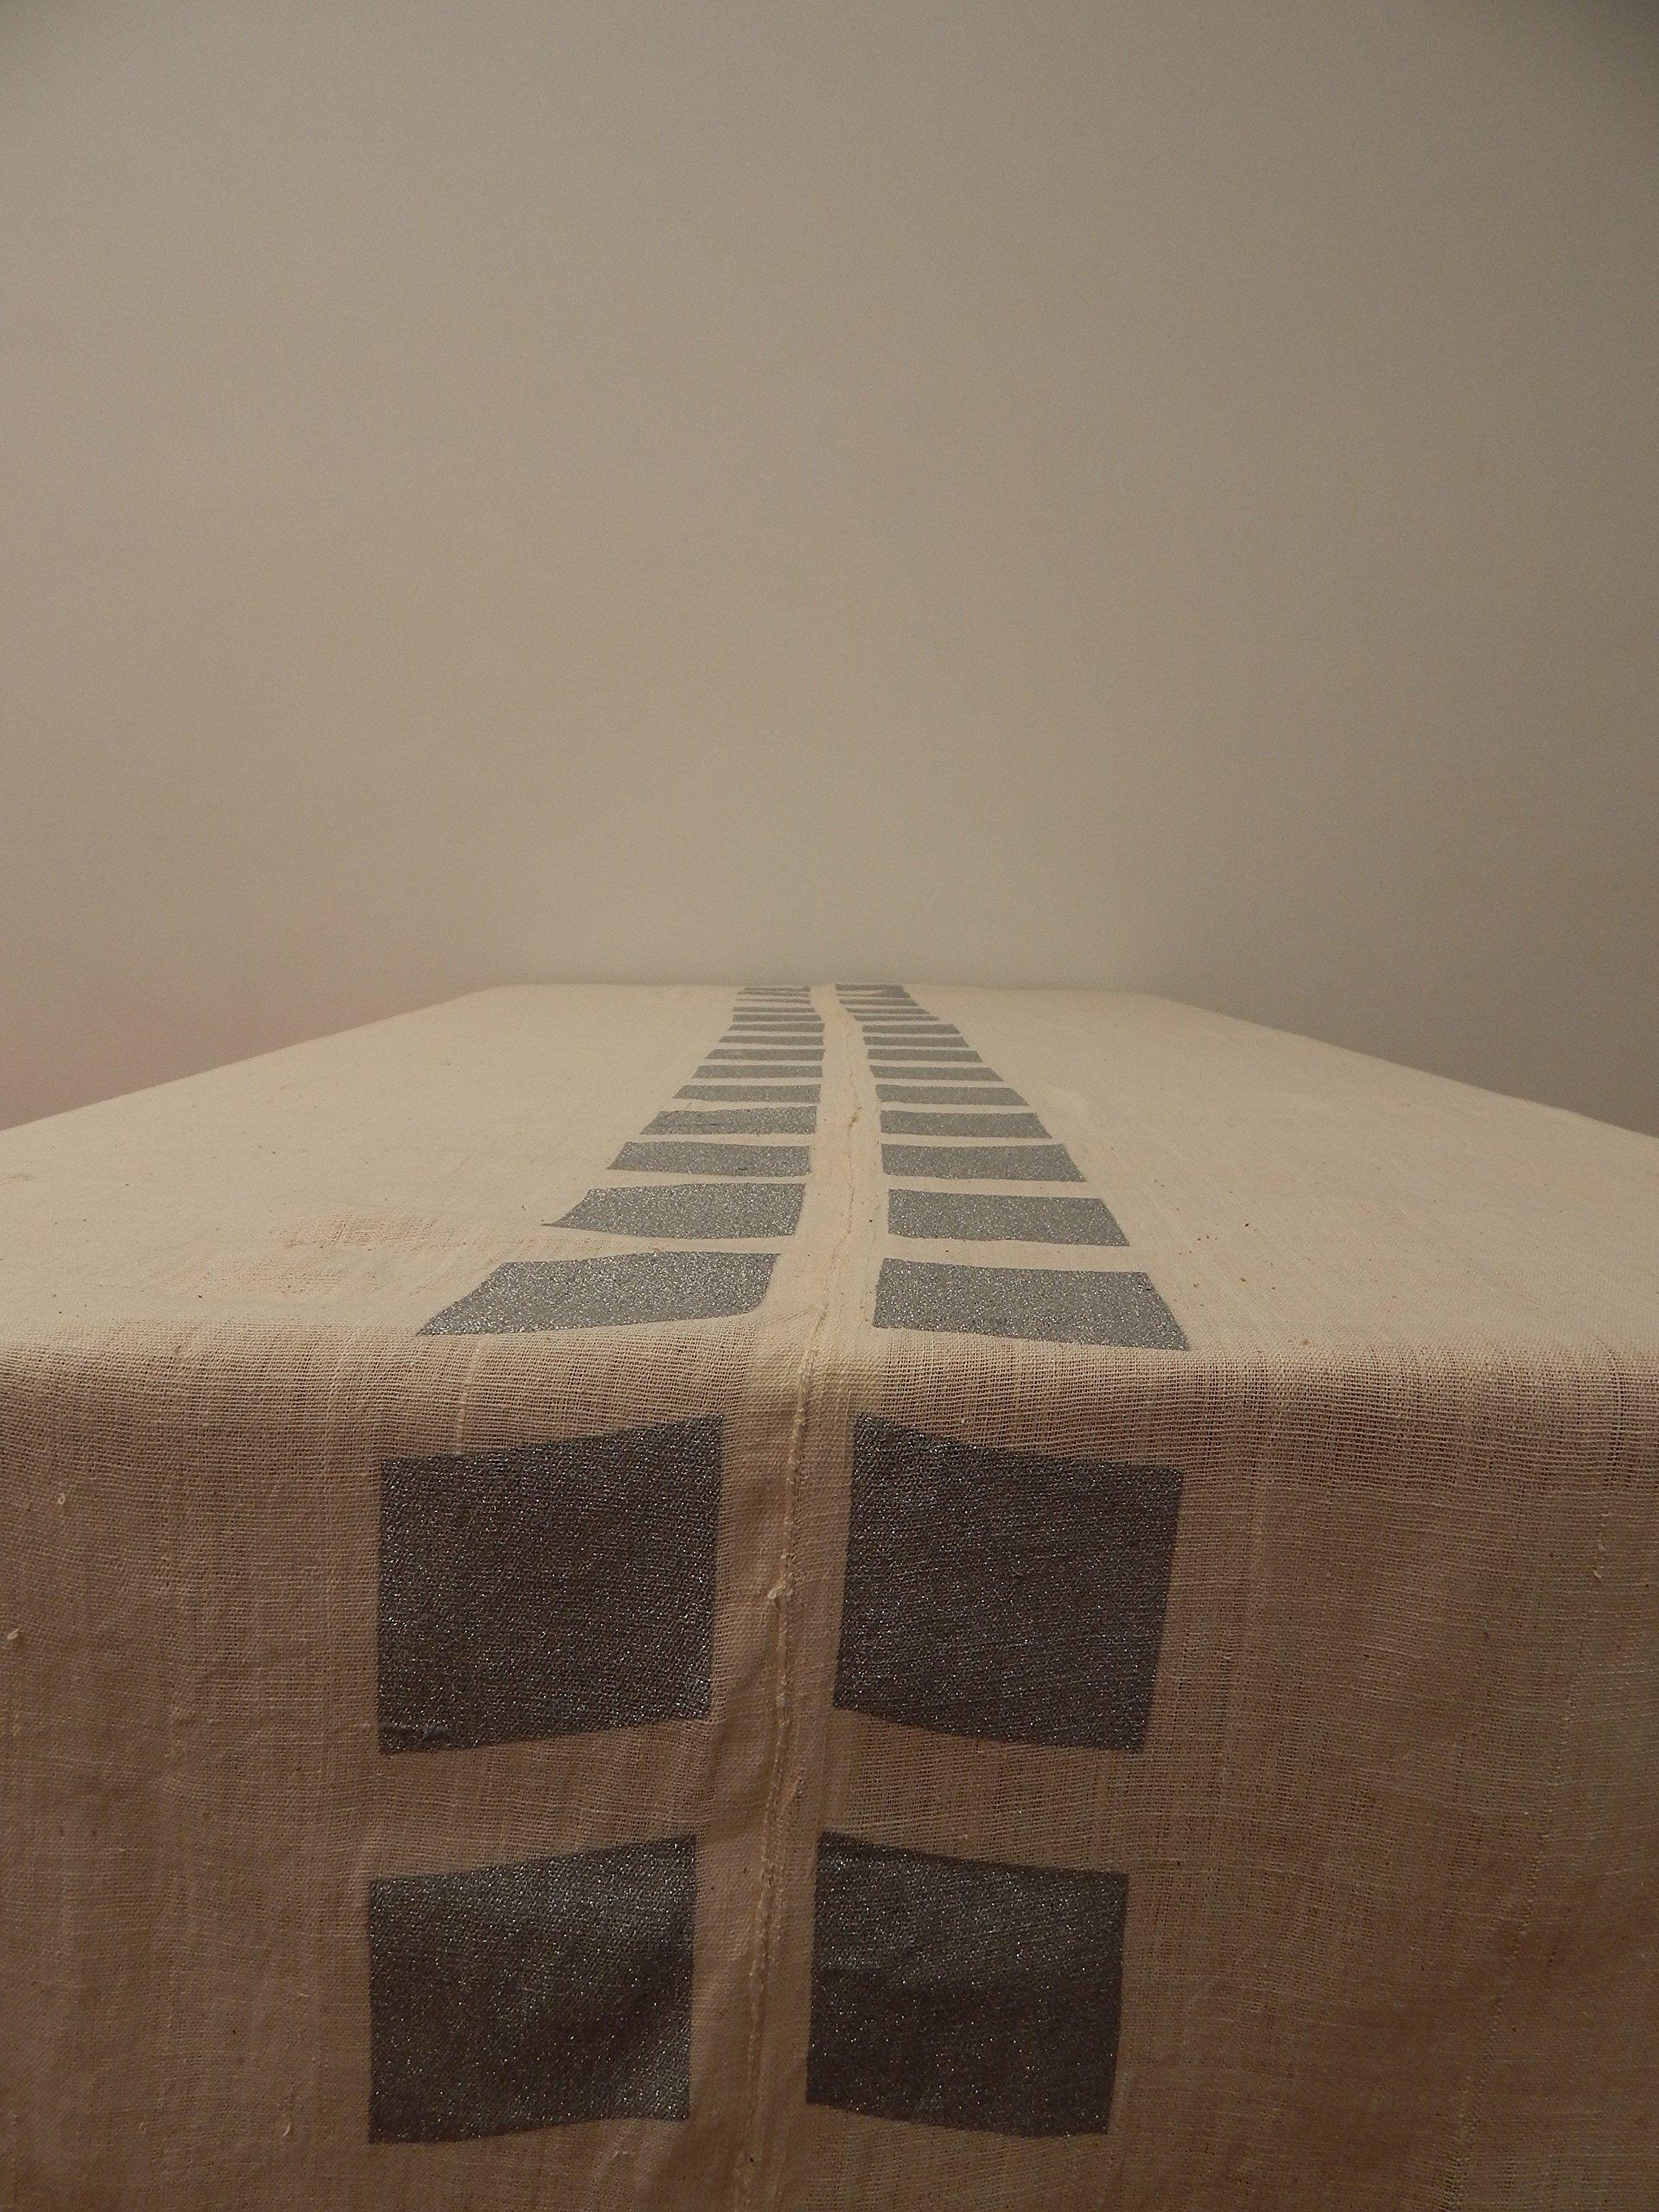 Gitika Goyal Home Cotton Khadi Silver Screen Printed Tablecloth with Square Design, Cream, 72'' x 72''